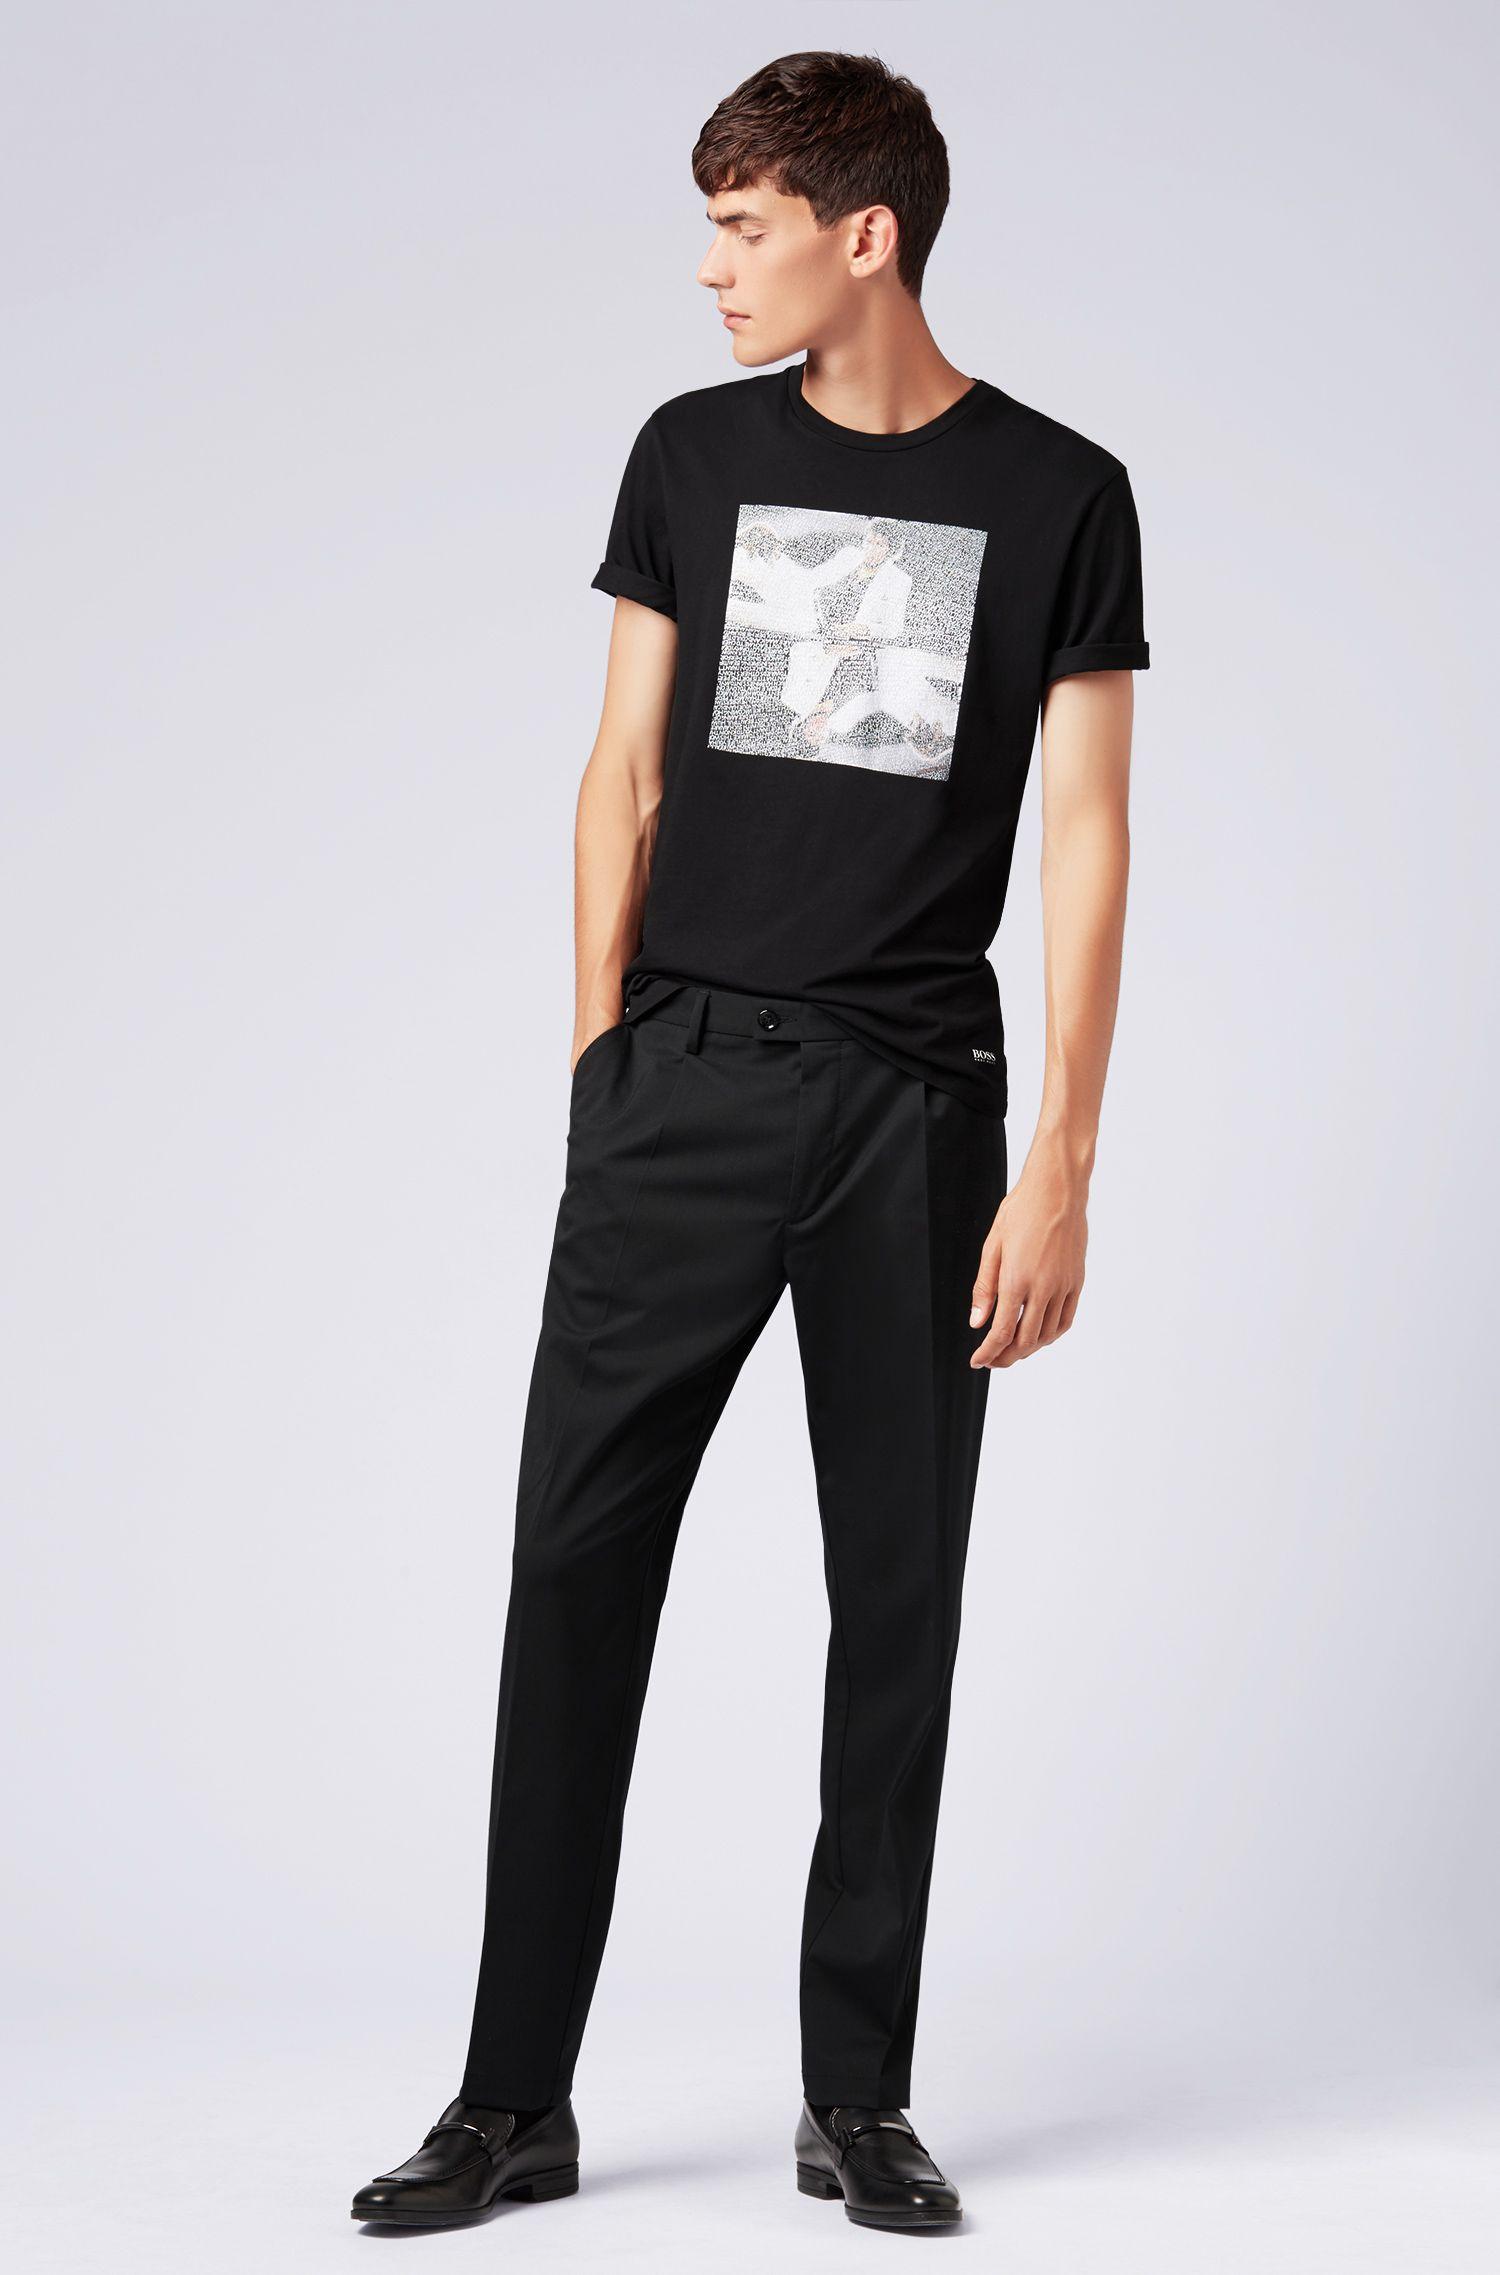 Unisex cotton T-shirt with Michael Jackson art print, Black